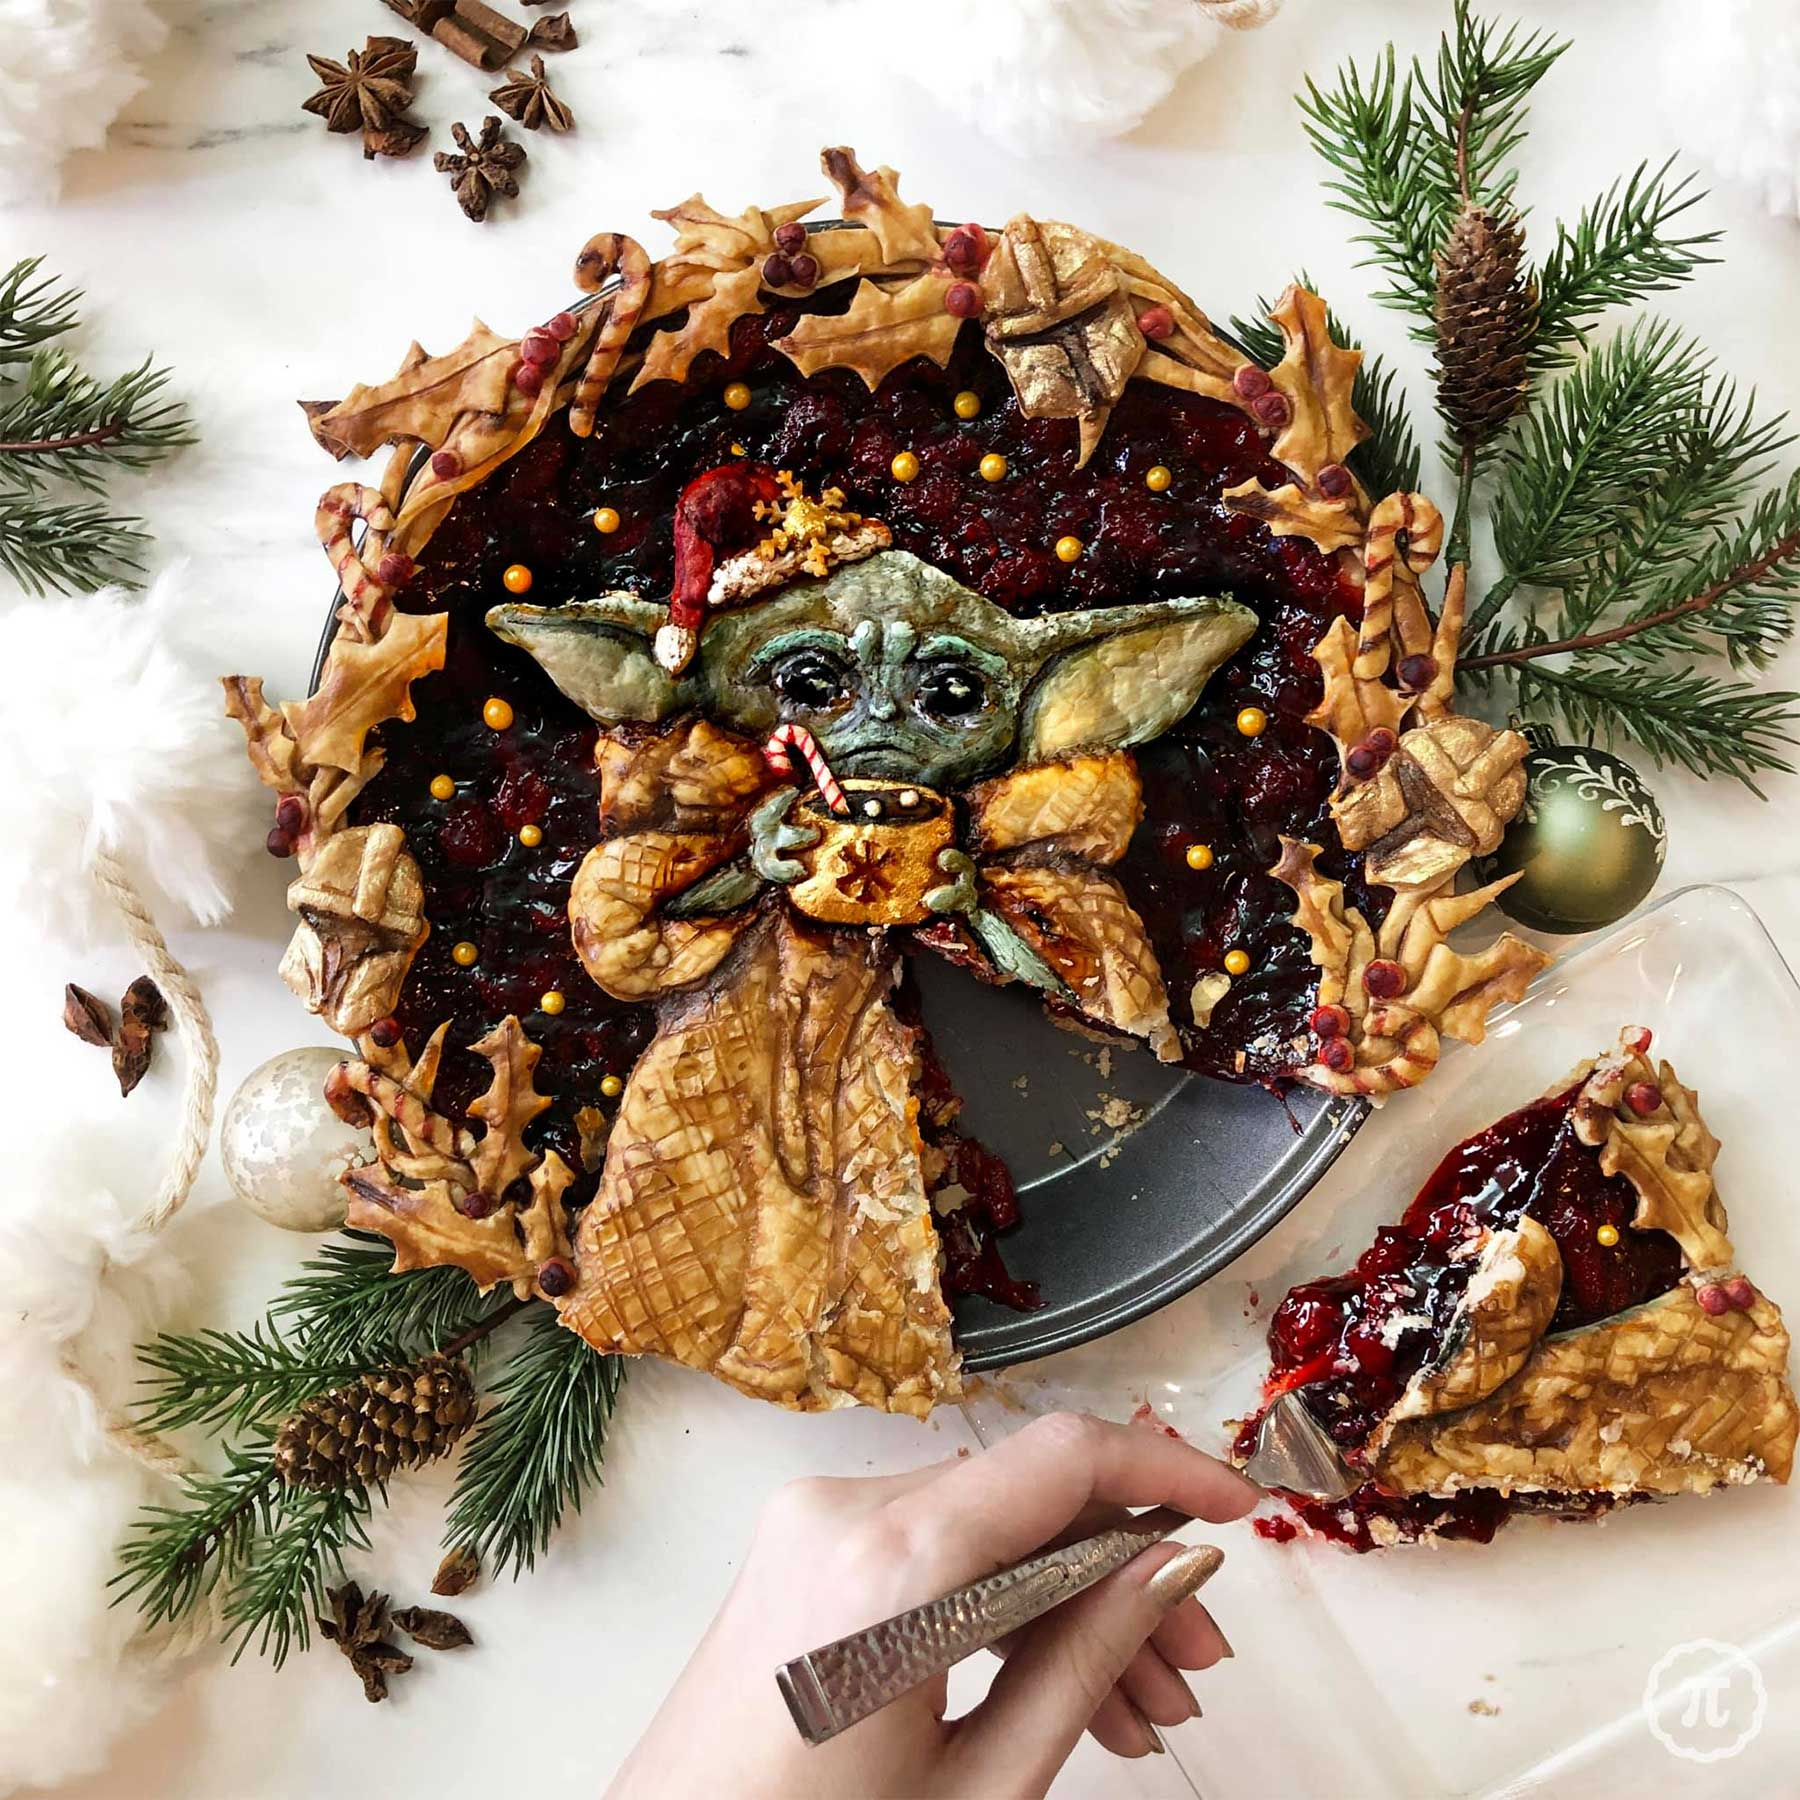 Kreative Kuchenkunst von Jessica Clark-Bojin piesareawesome-Jessica-Clark-Bojin_01